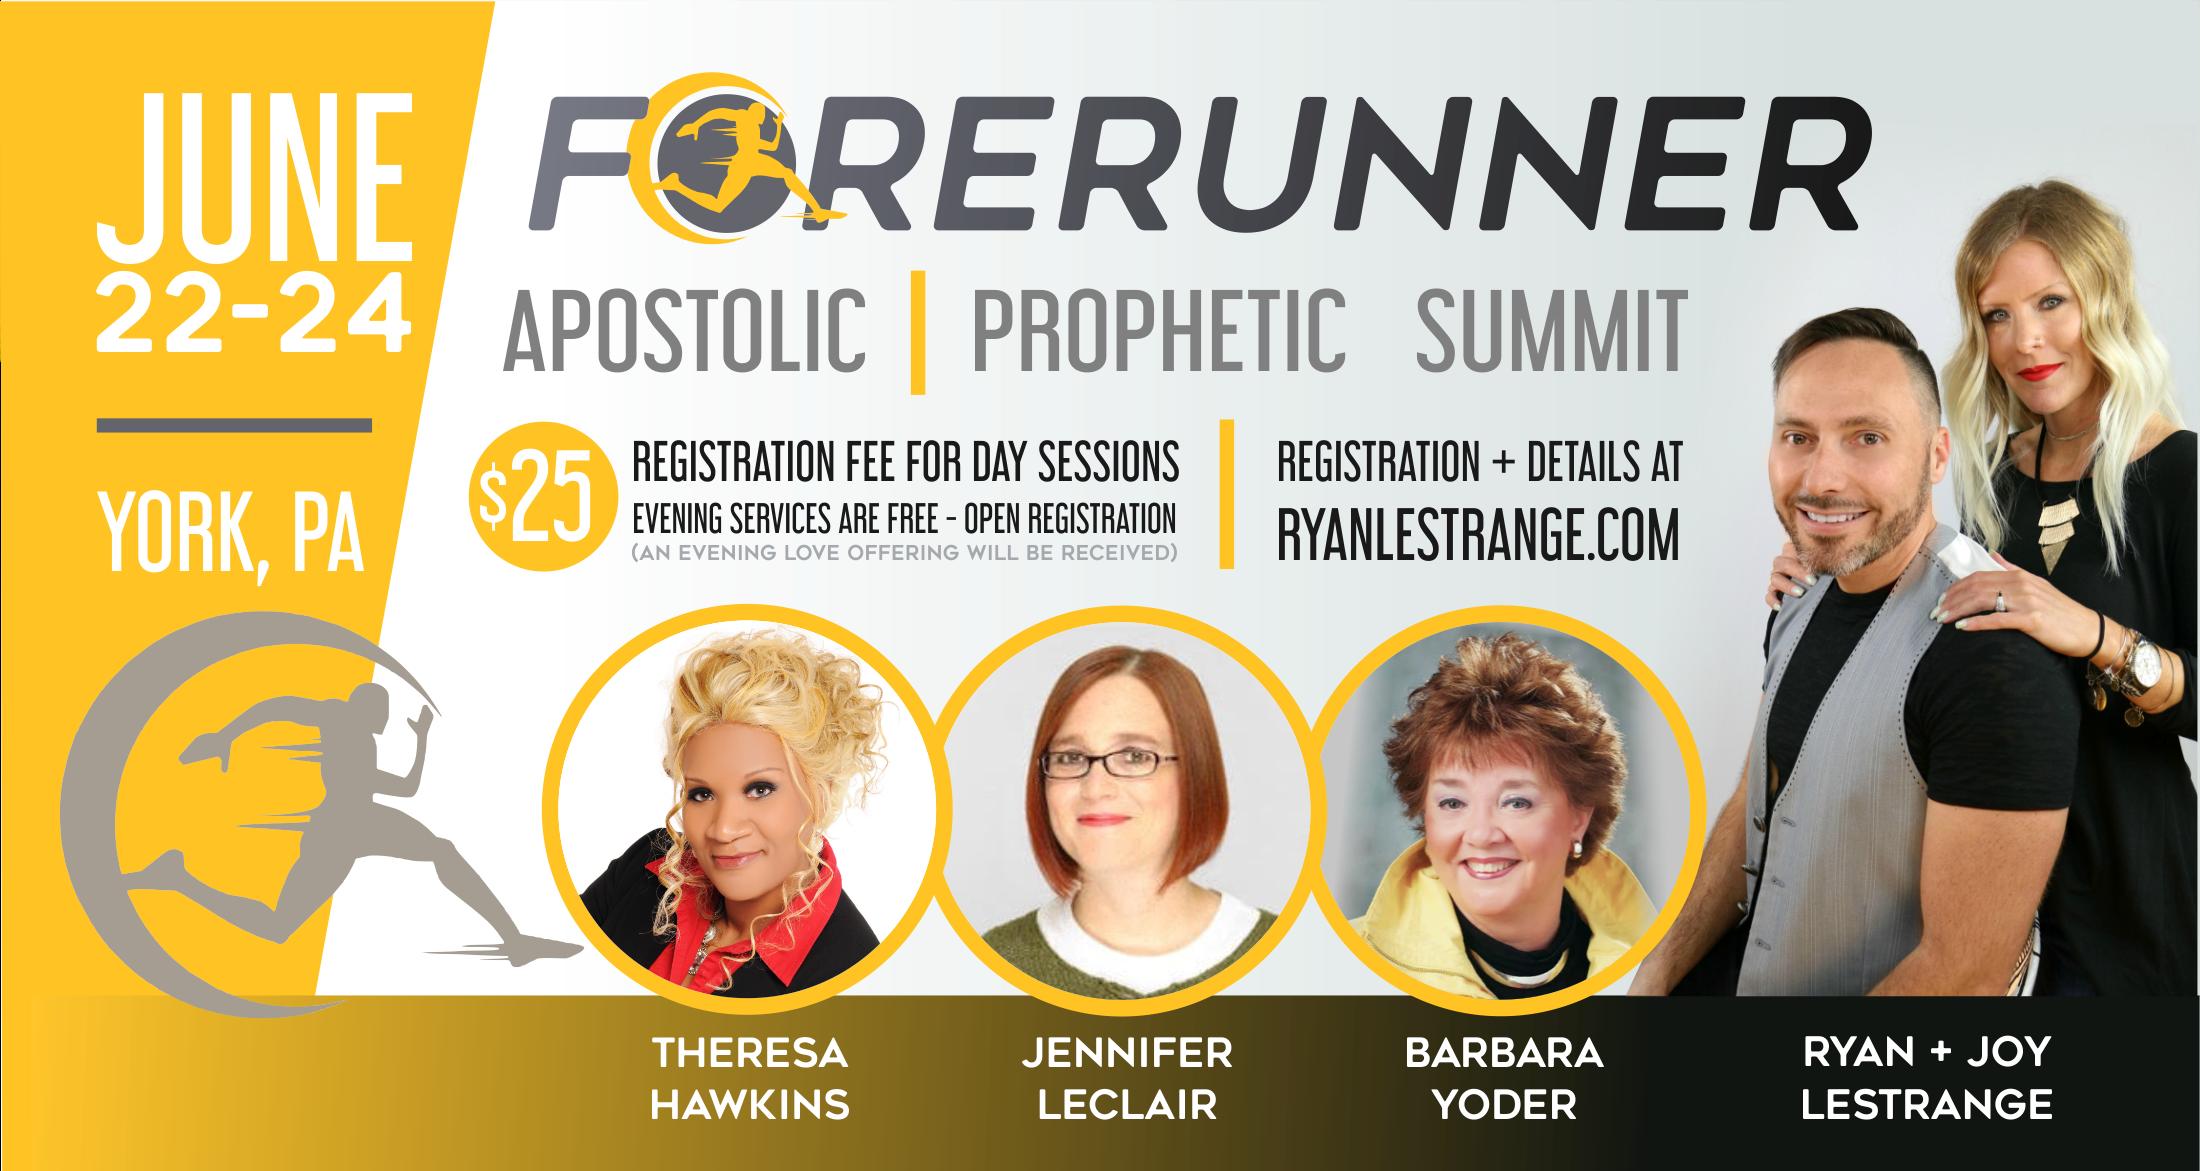 FORERUNNER Apostolic/Prophetic Summit